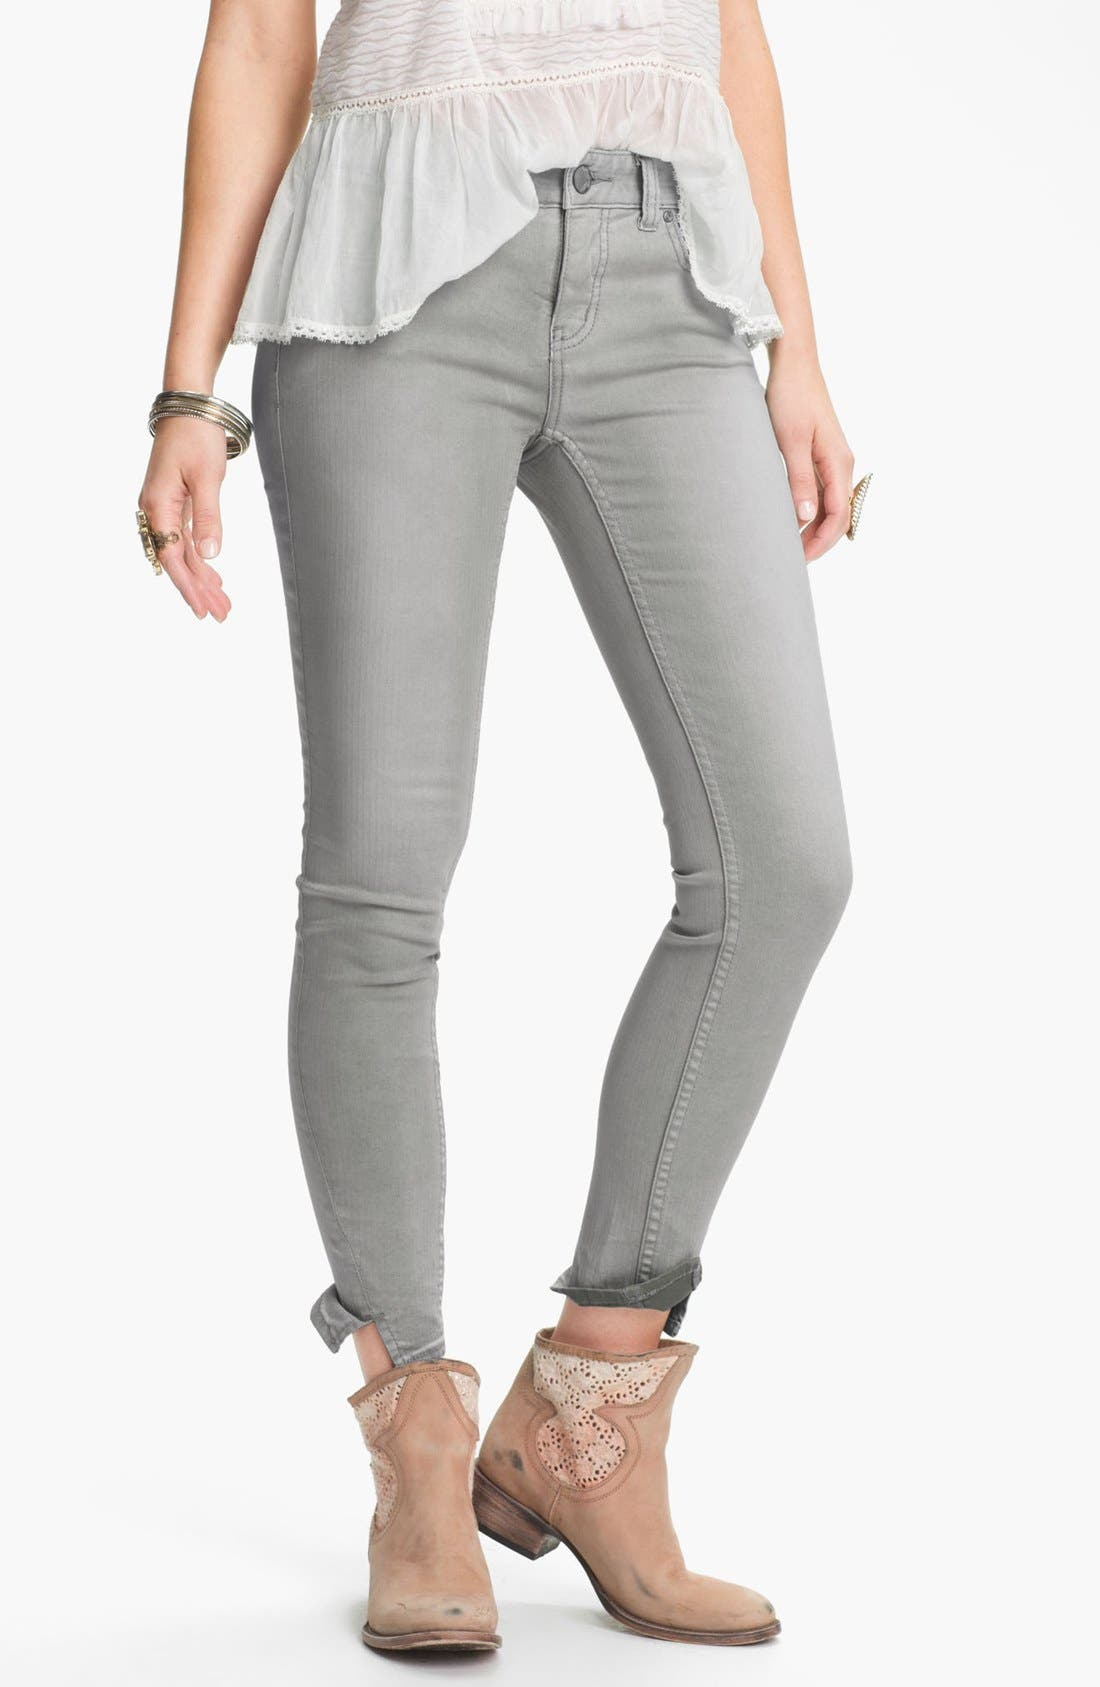 Alternate Image 1 Selected - Free People Crop Stretch Denim Skinny Jeans (Desi Wash)